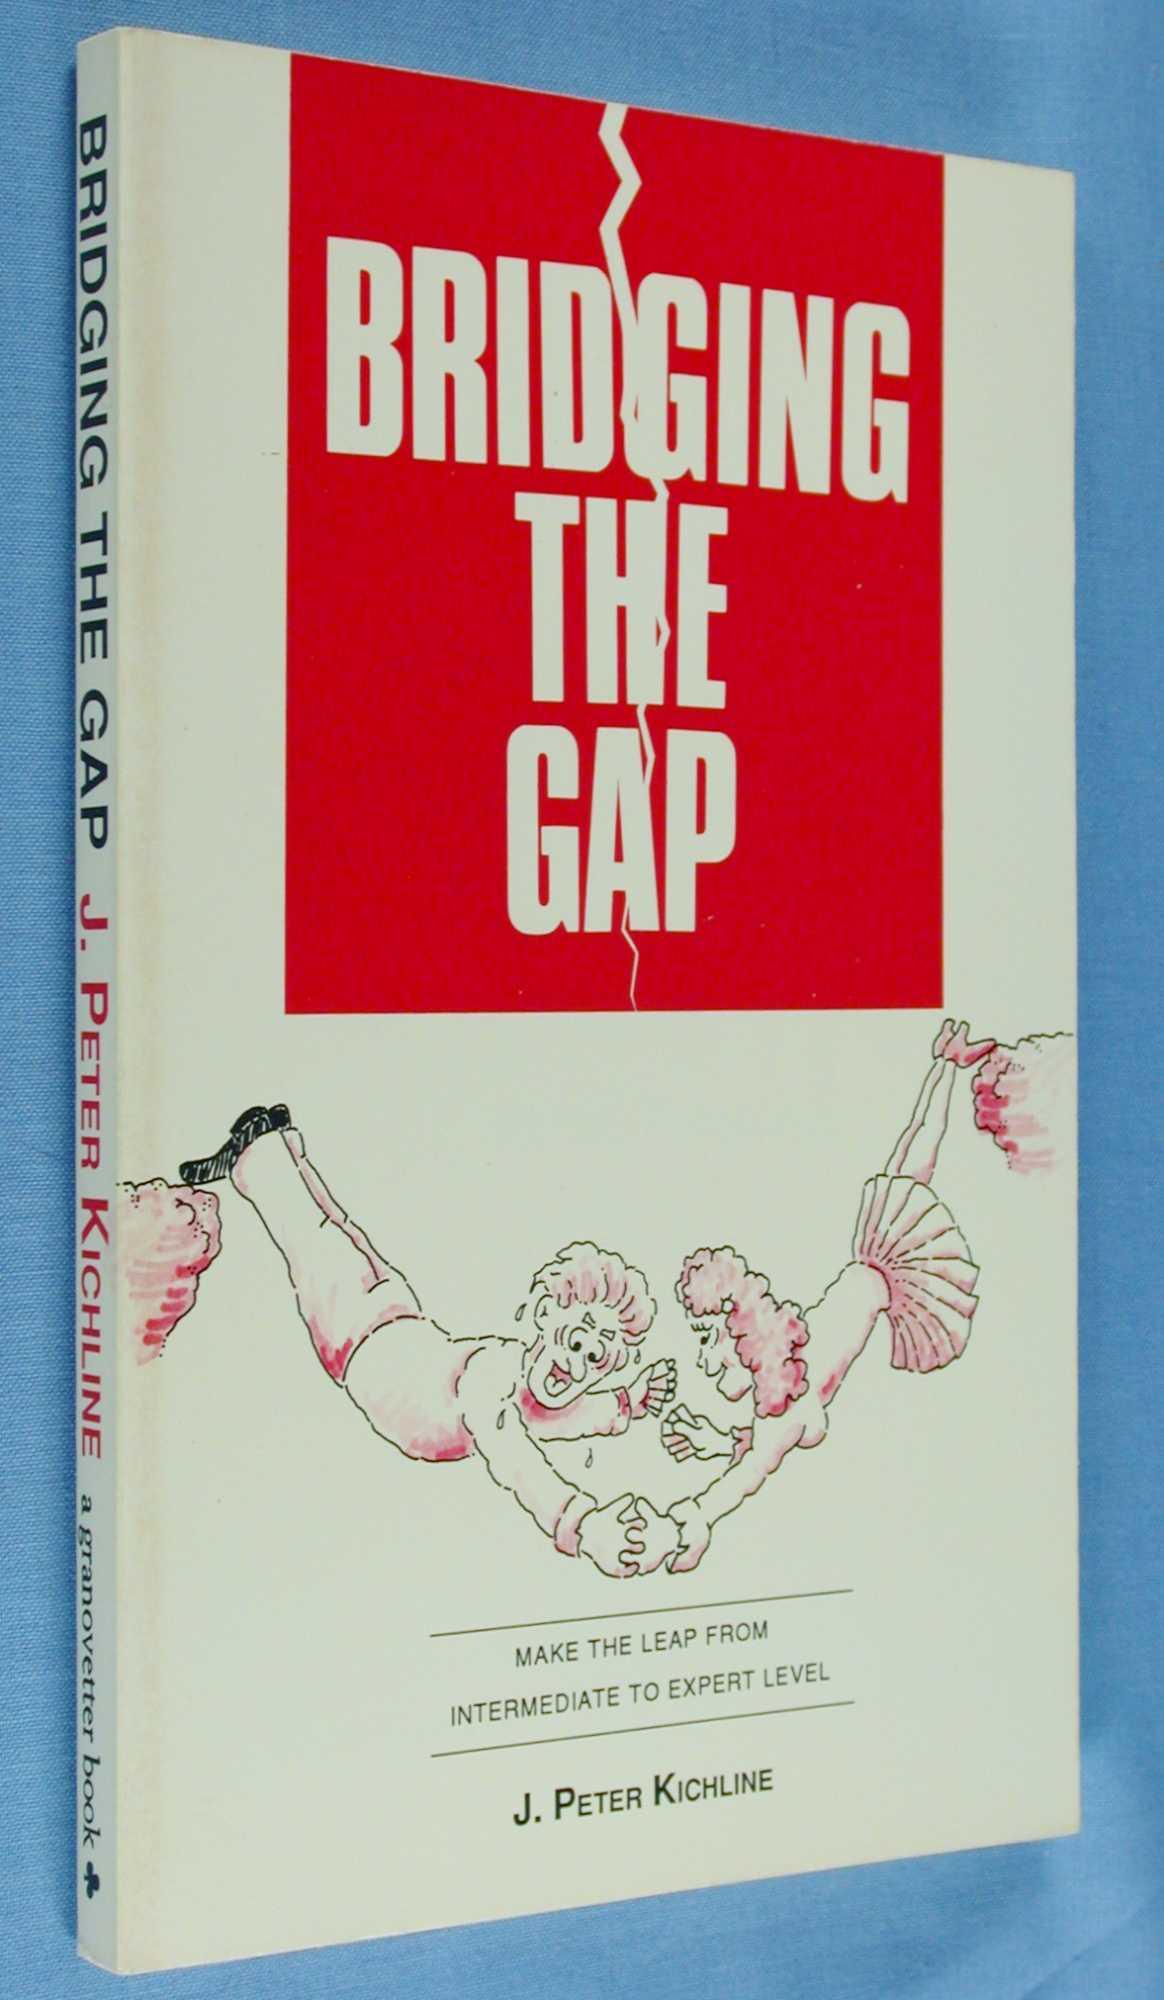 Bridging the Gap, Kichline, J.Peter